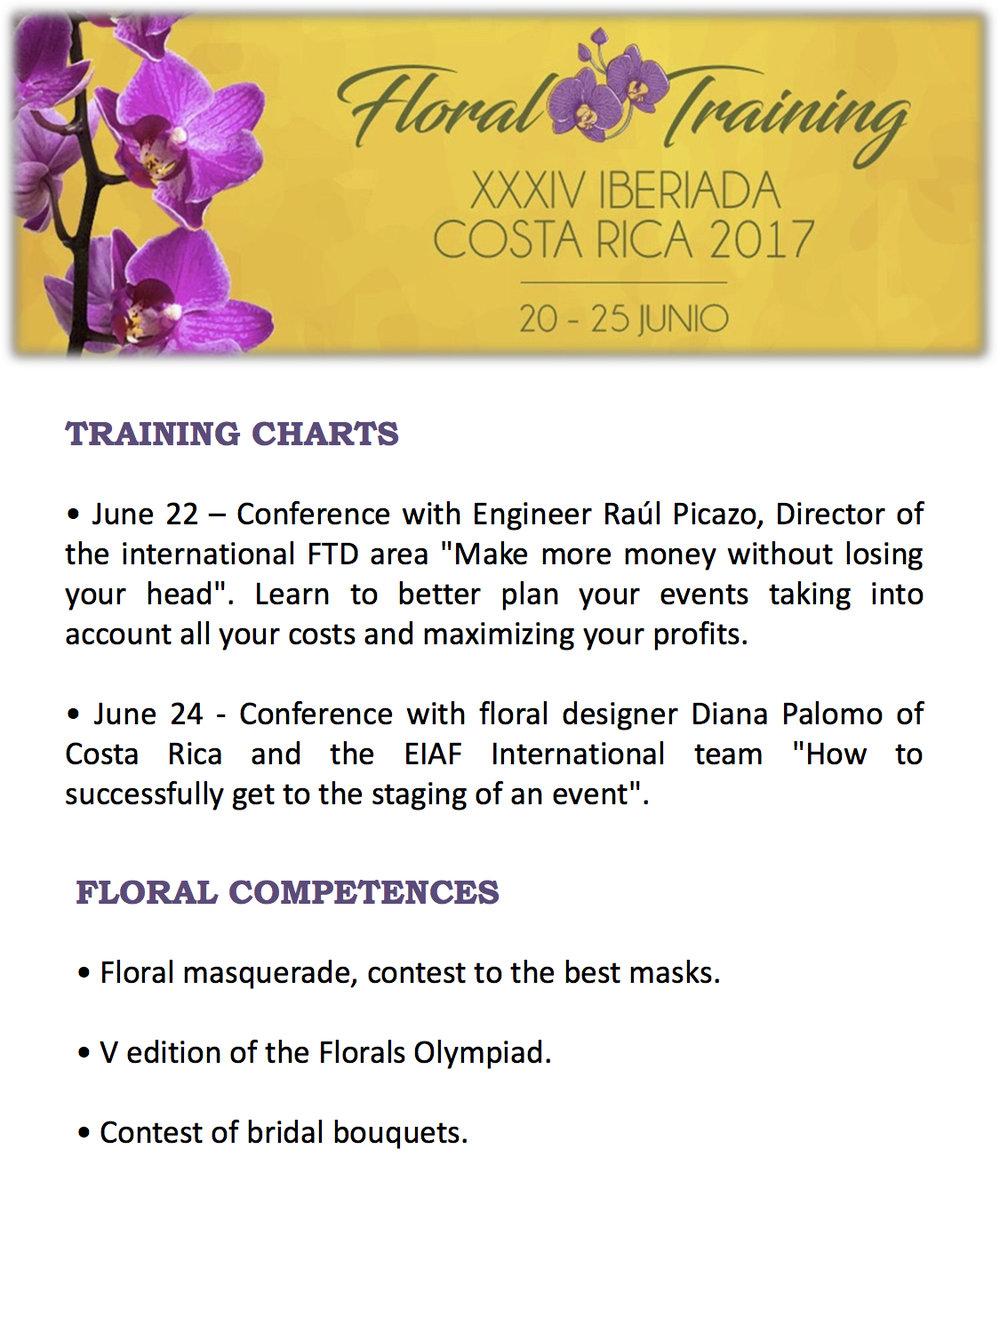 Floral Training - XXXIV Iberiada Costa Rica 2017 (English) 8.jpg